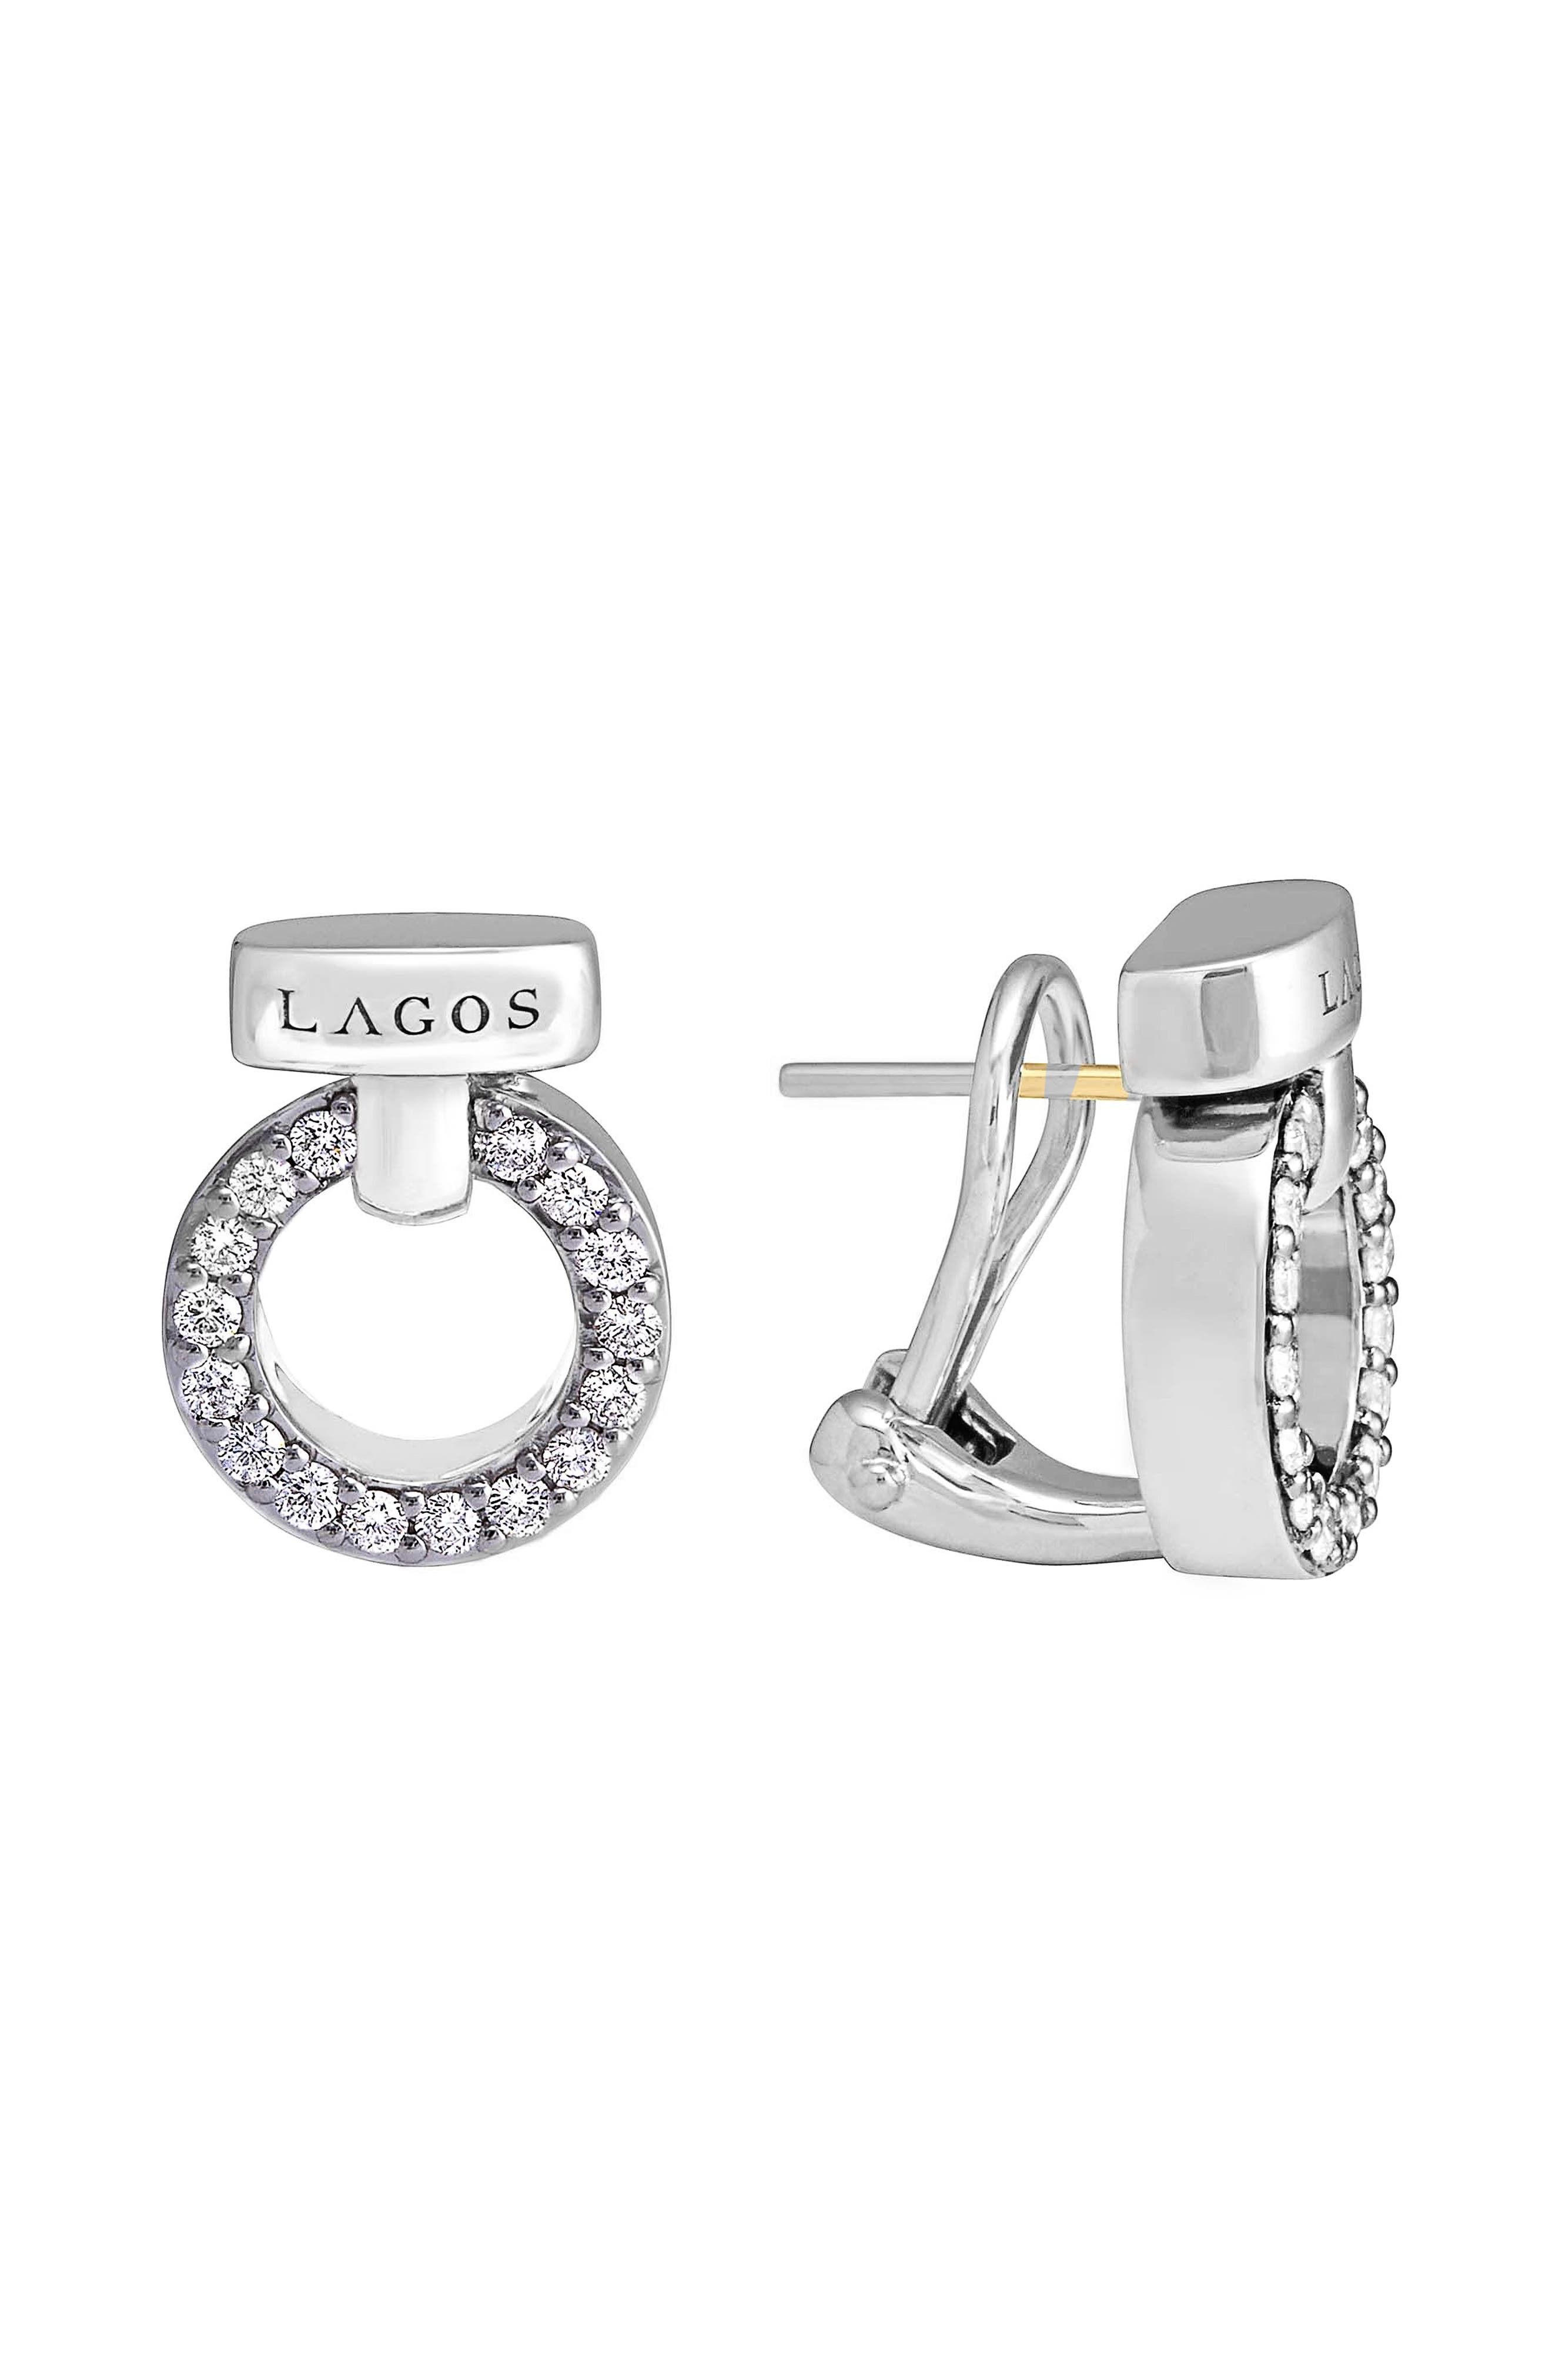 'Enso - Circle Game' Diamond Stud Earrings,                             Main thumbnail 1, color,                             SILVER